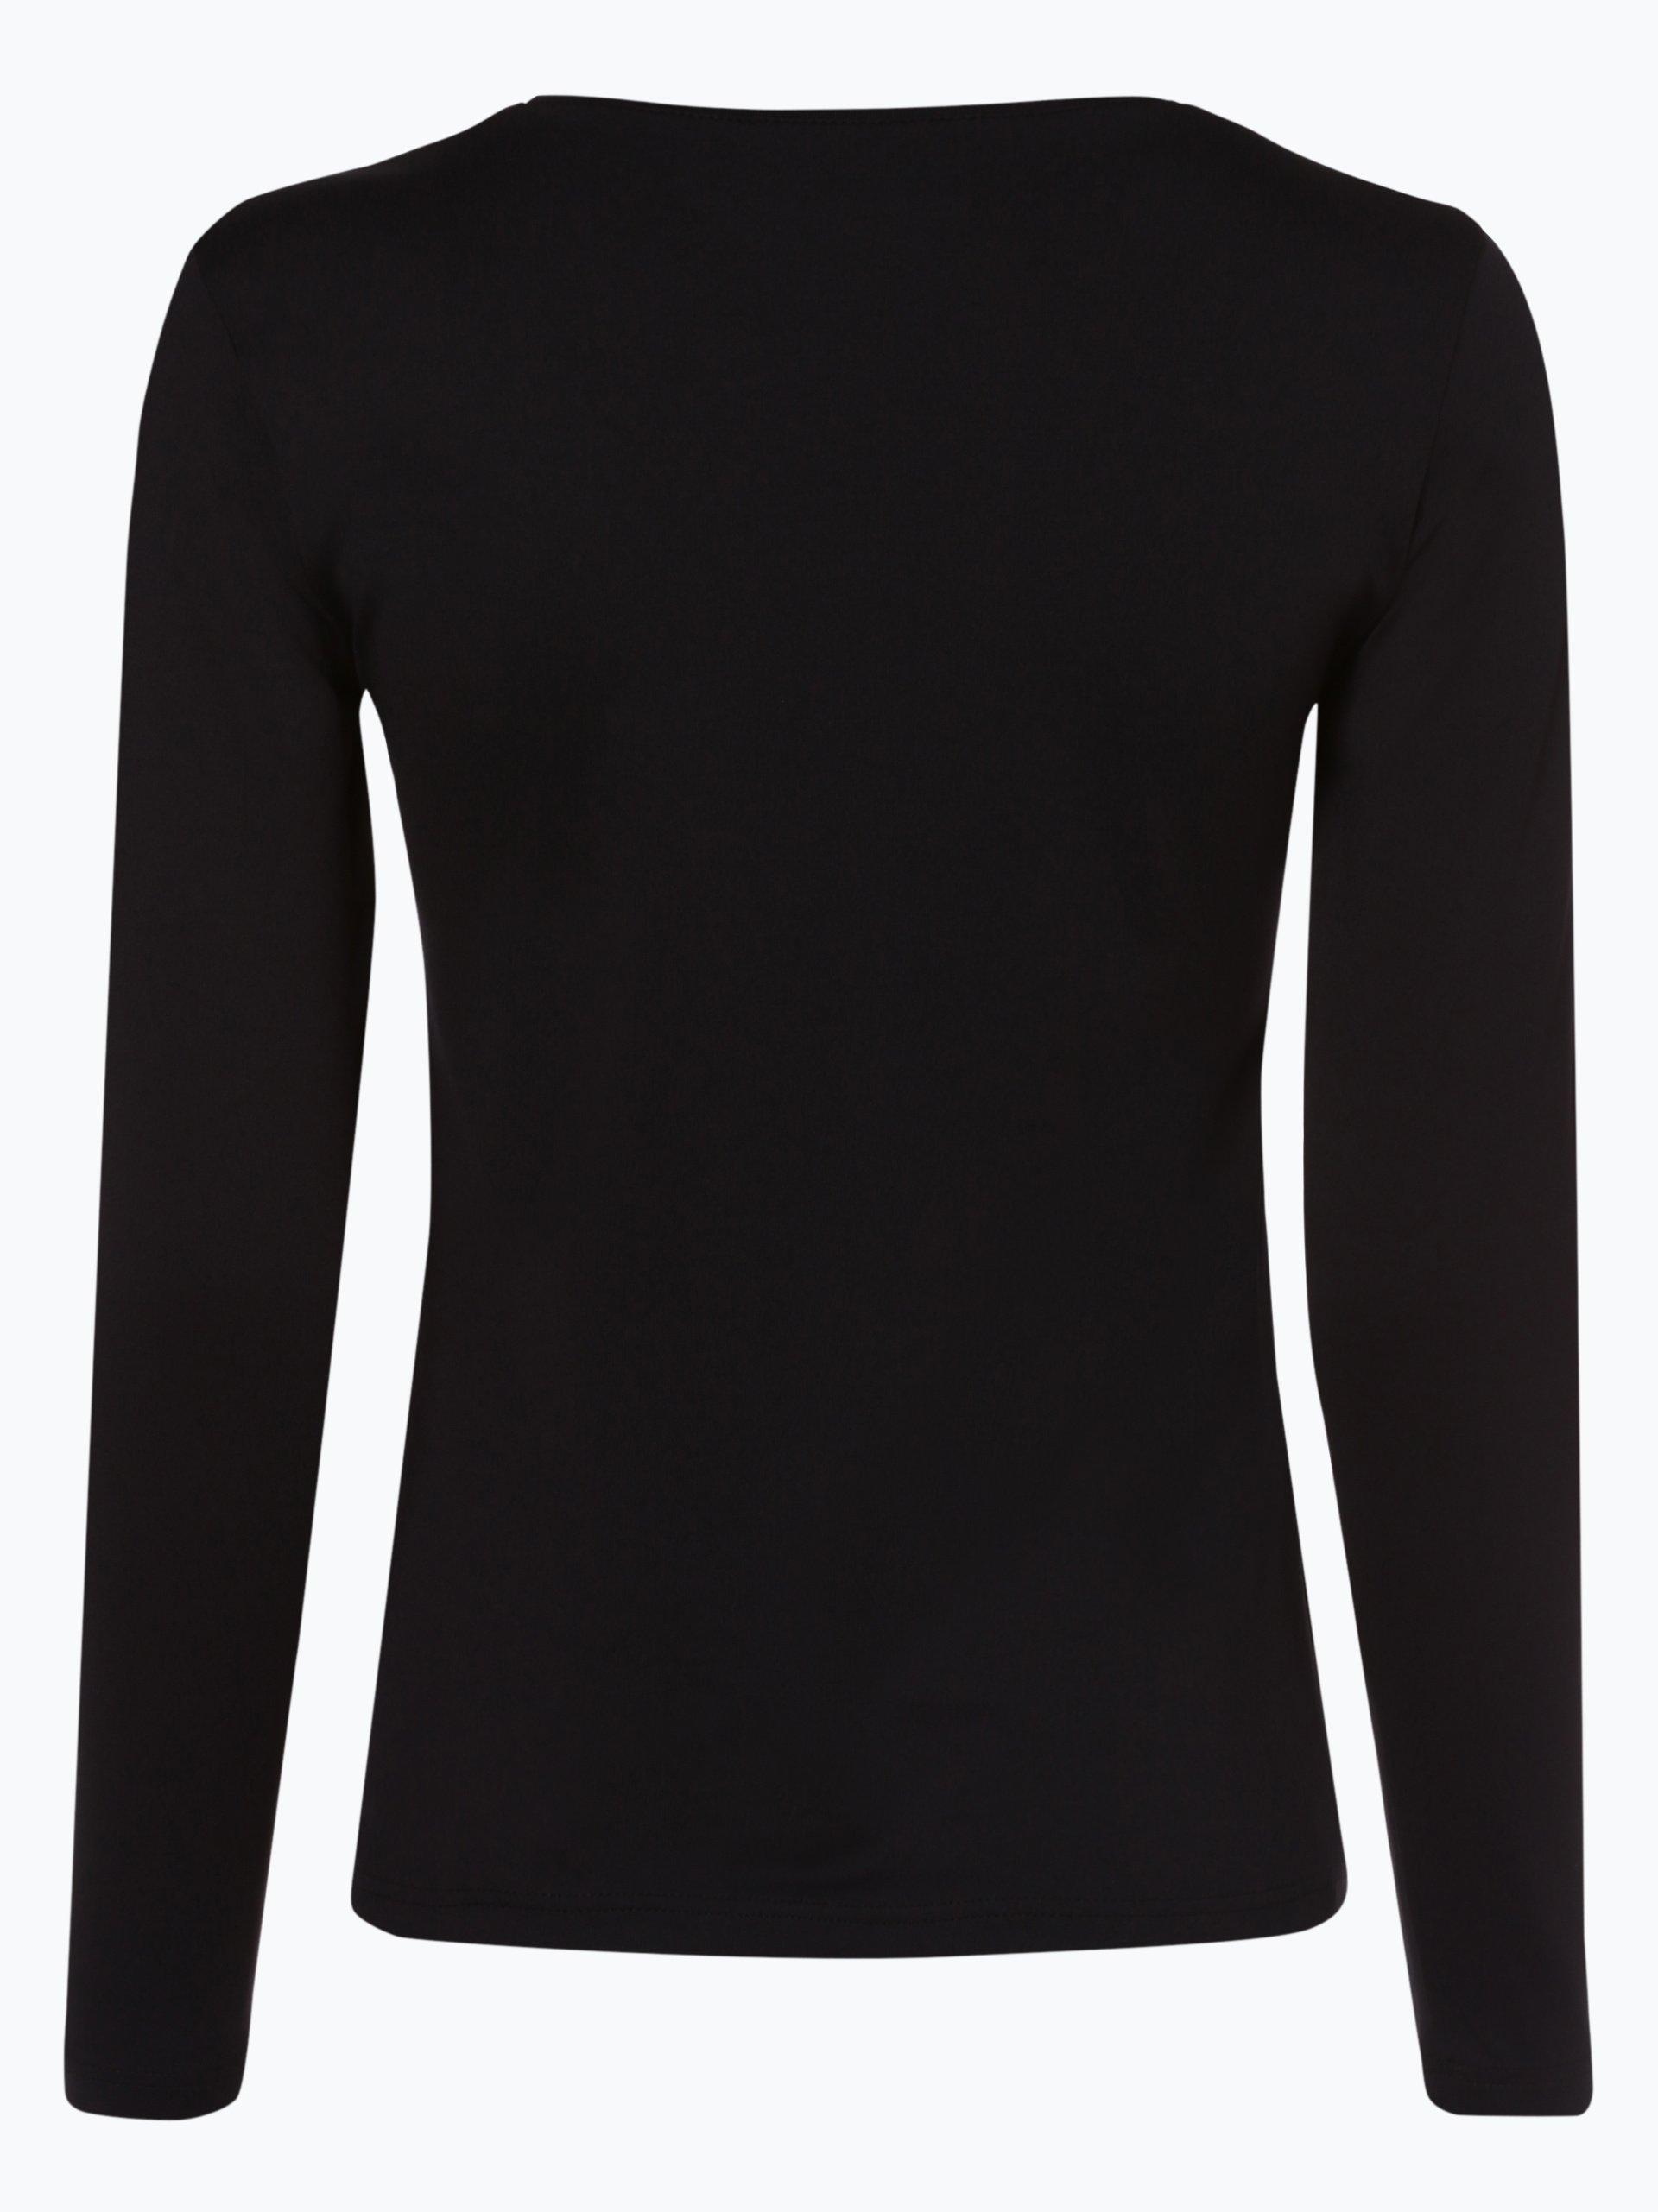 Apriori Damska koszulka z długim rękawem